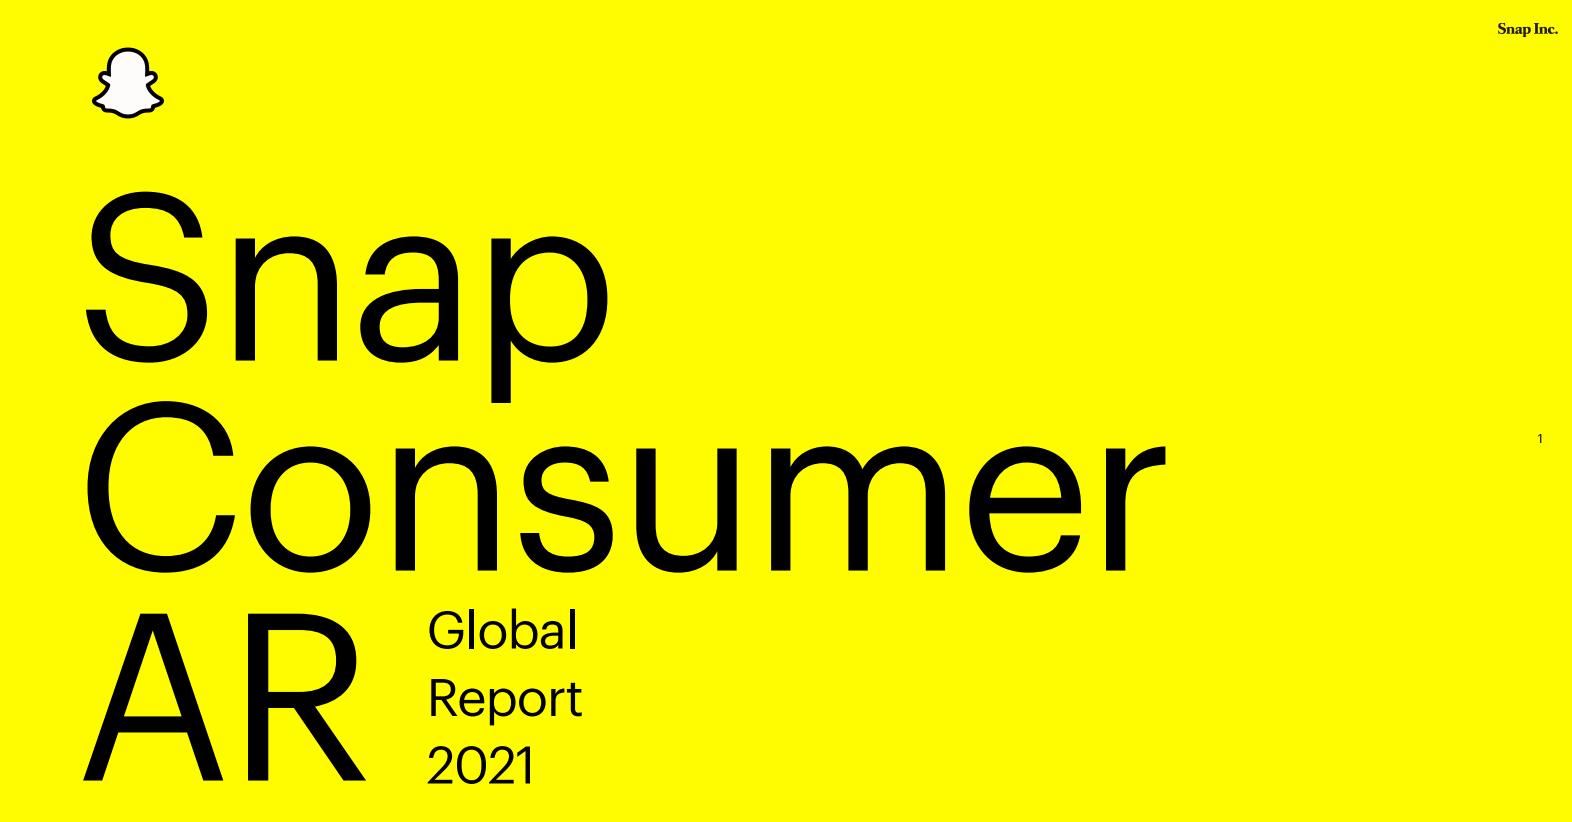 Snapchat发布消费者AR报告:目前有超1亿用户正在使用AR进行购物